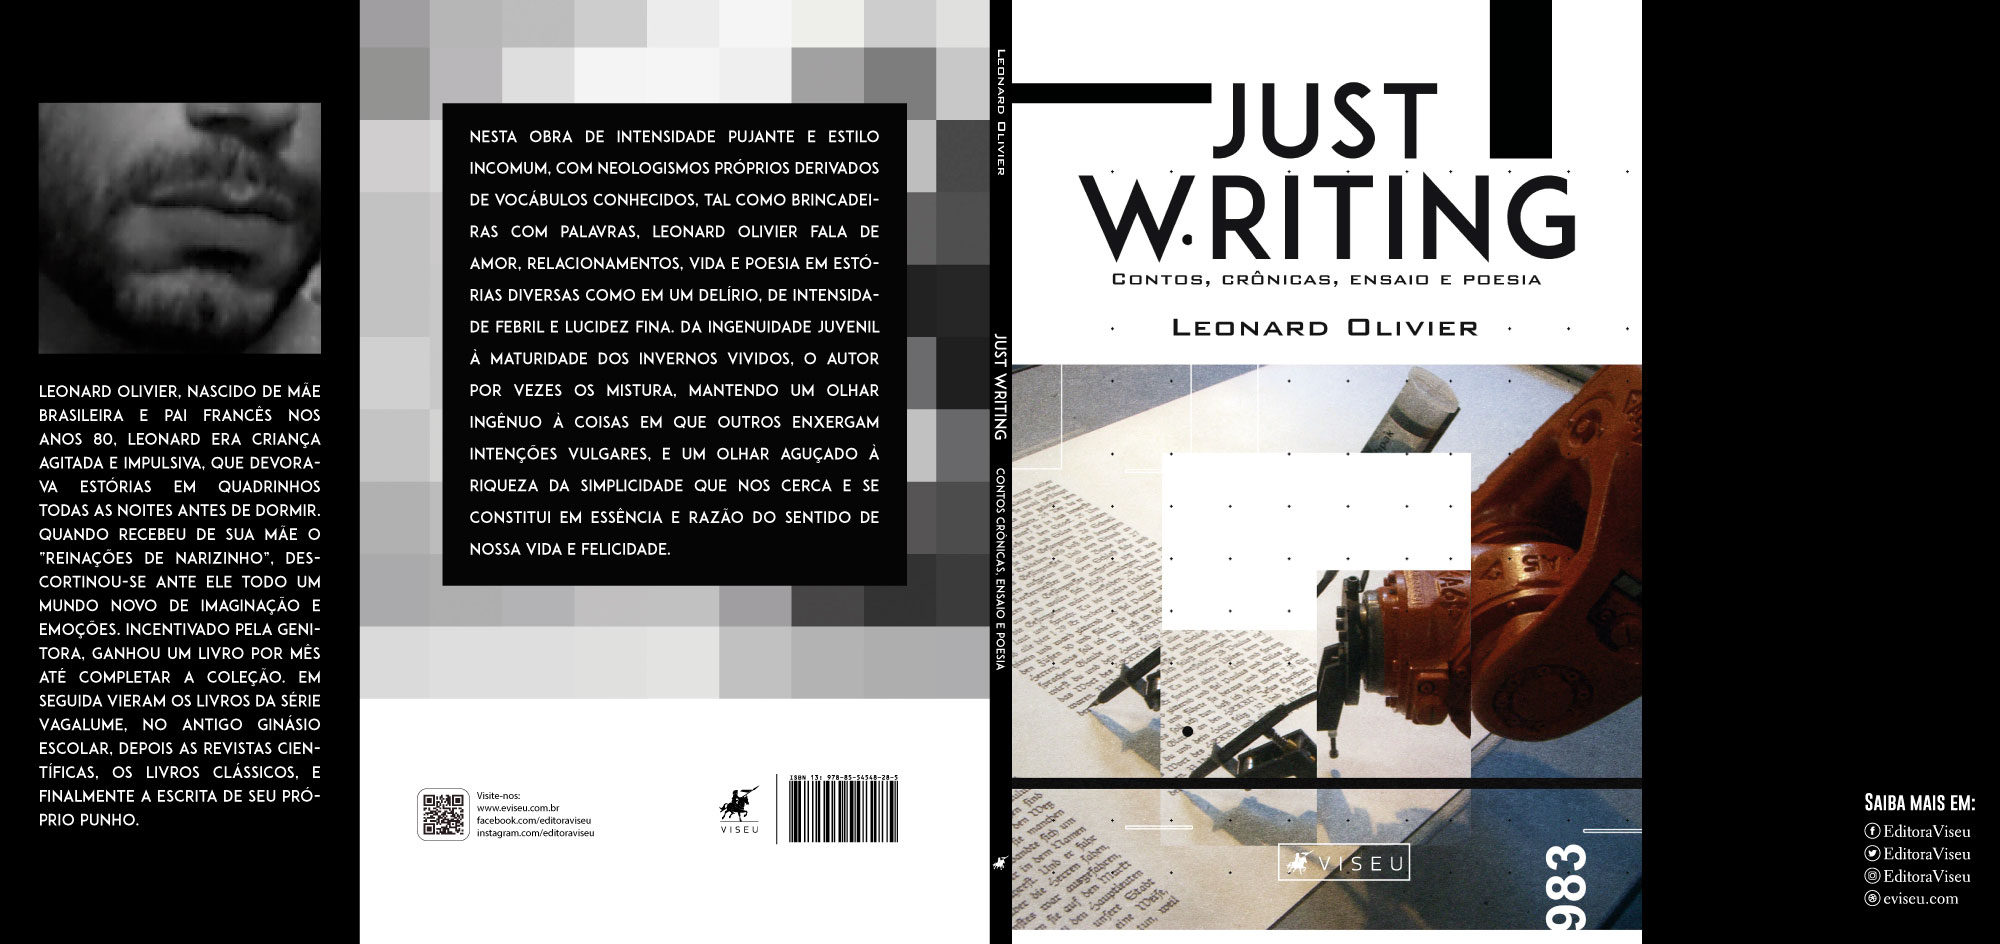 Capa-completa-Just-Writing-Avena80